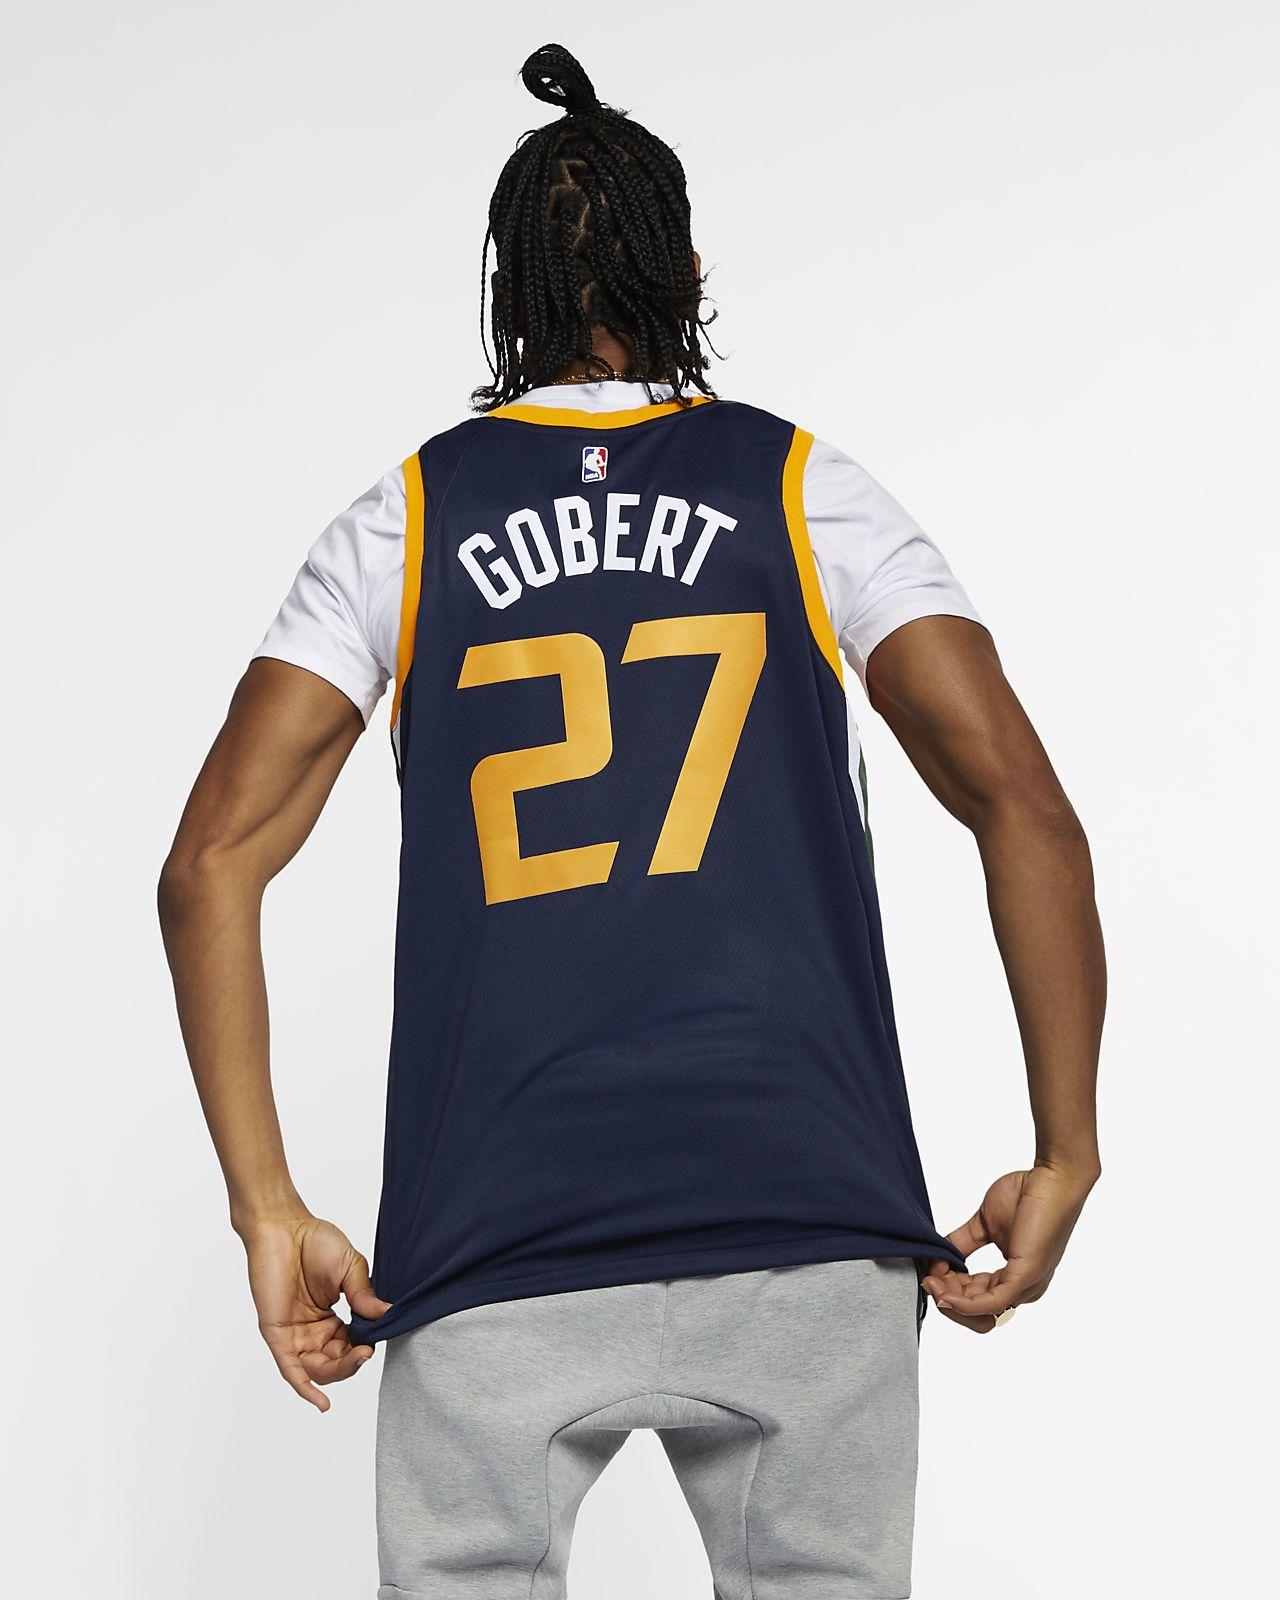 d66ad0e2a5f2 ... Rudy Gobert Icon Edition Swingman (Utah Jazz) Men s Nike NBA Connected  Jersey